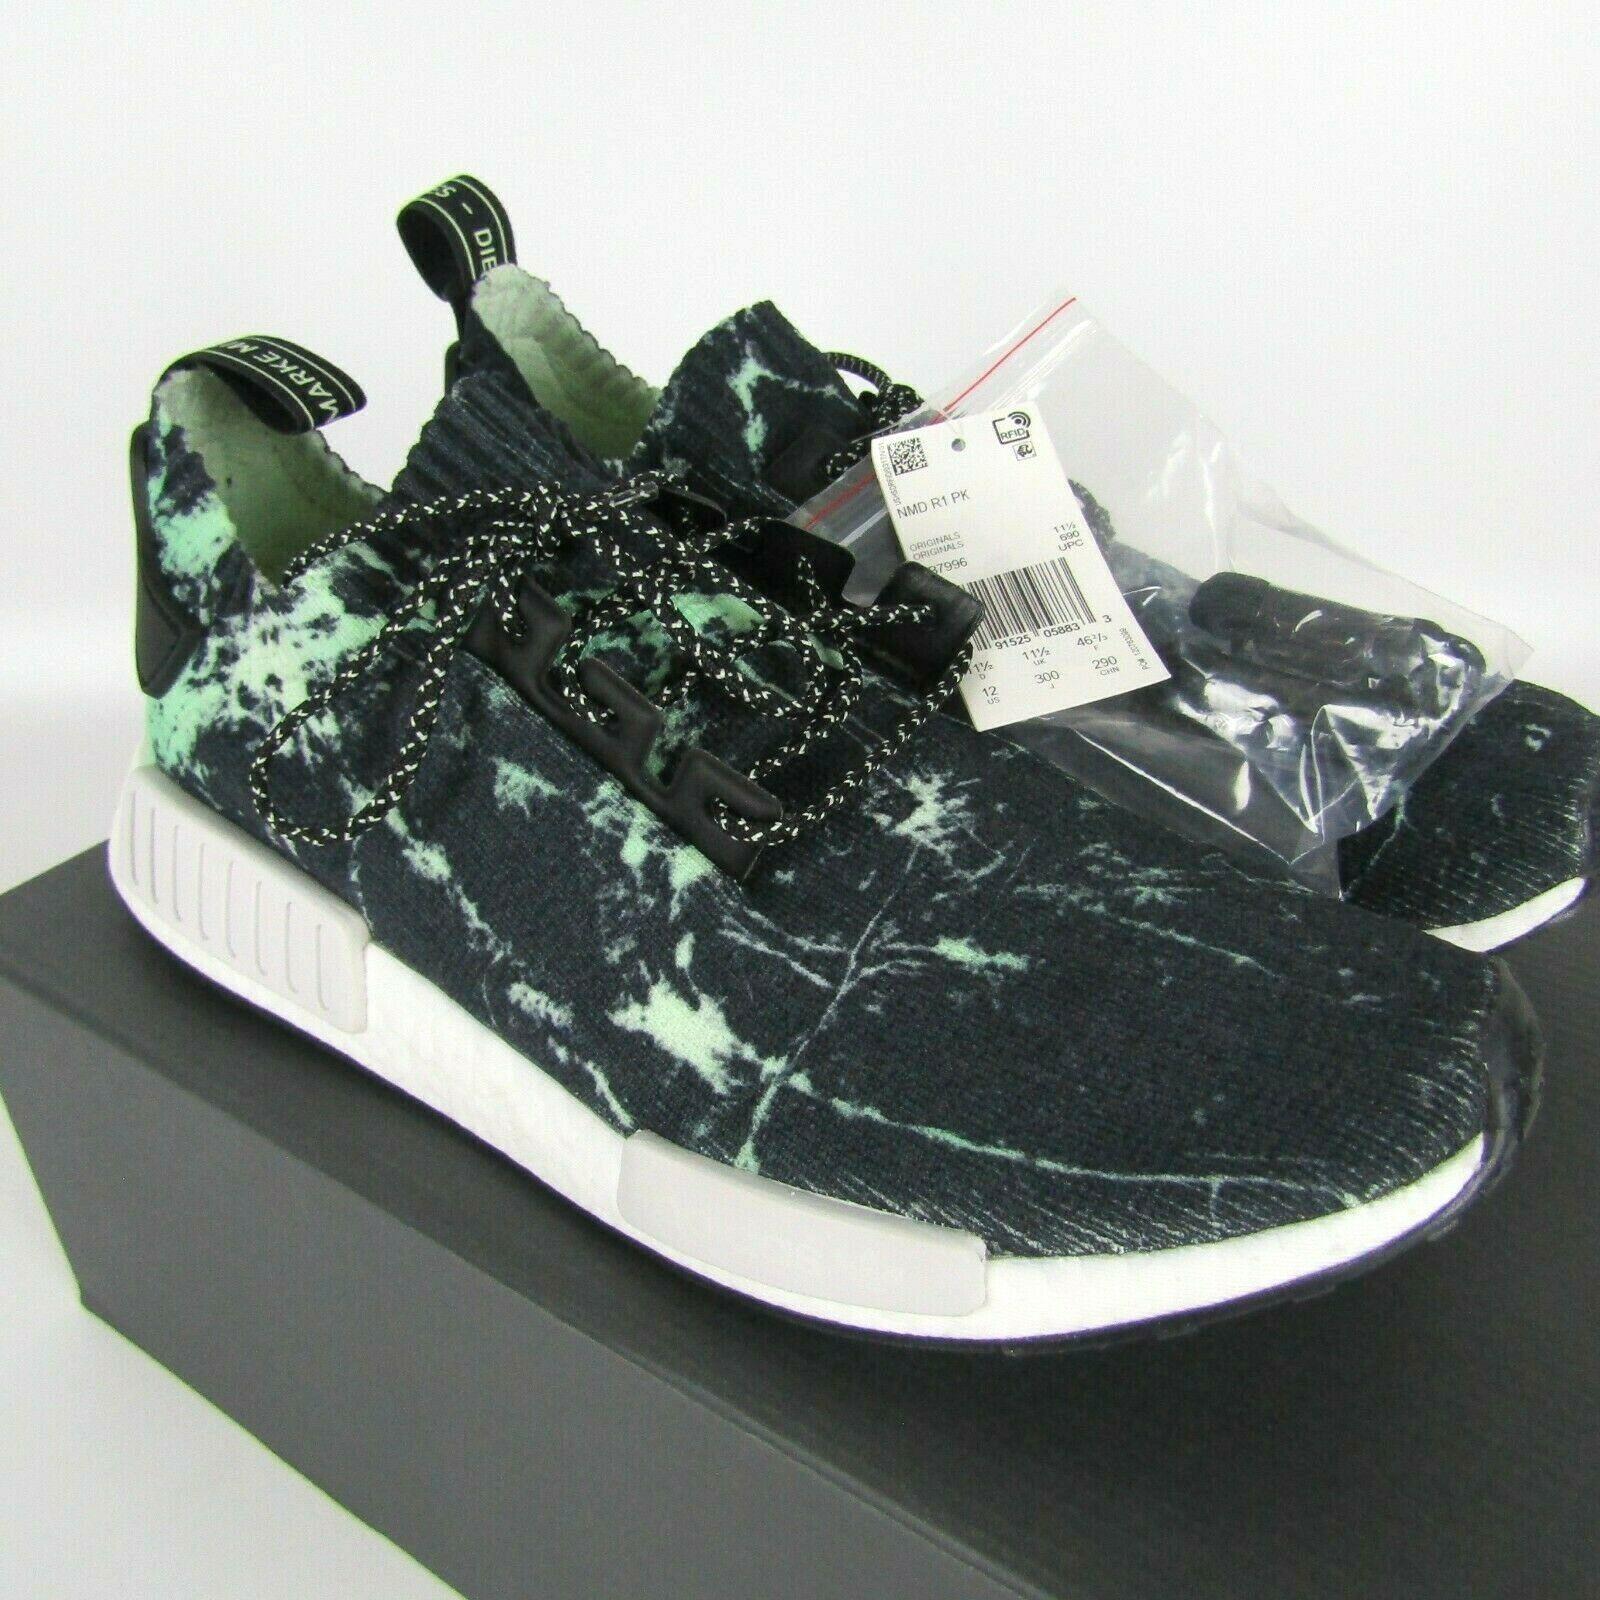 "Adidas Nmd_R1 Primeknit "" Grün Marmor "" Schuhe Herren Größe 12 BB7996 image 2"